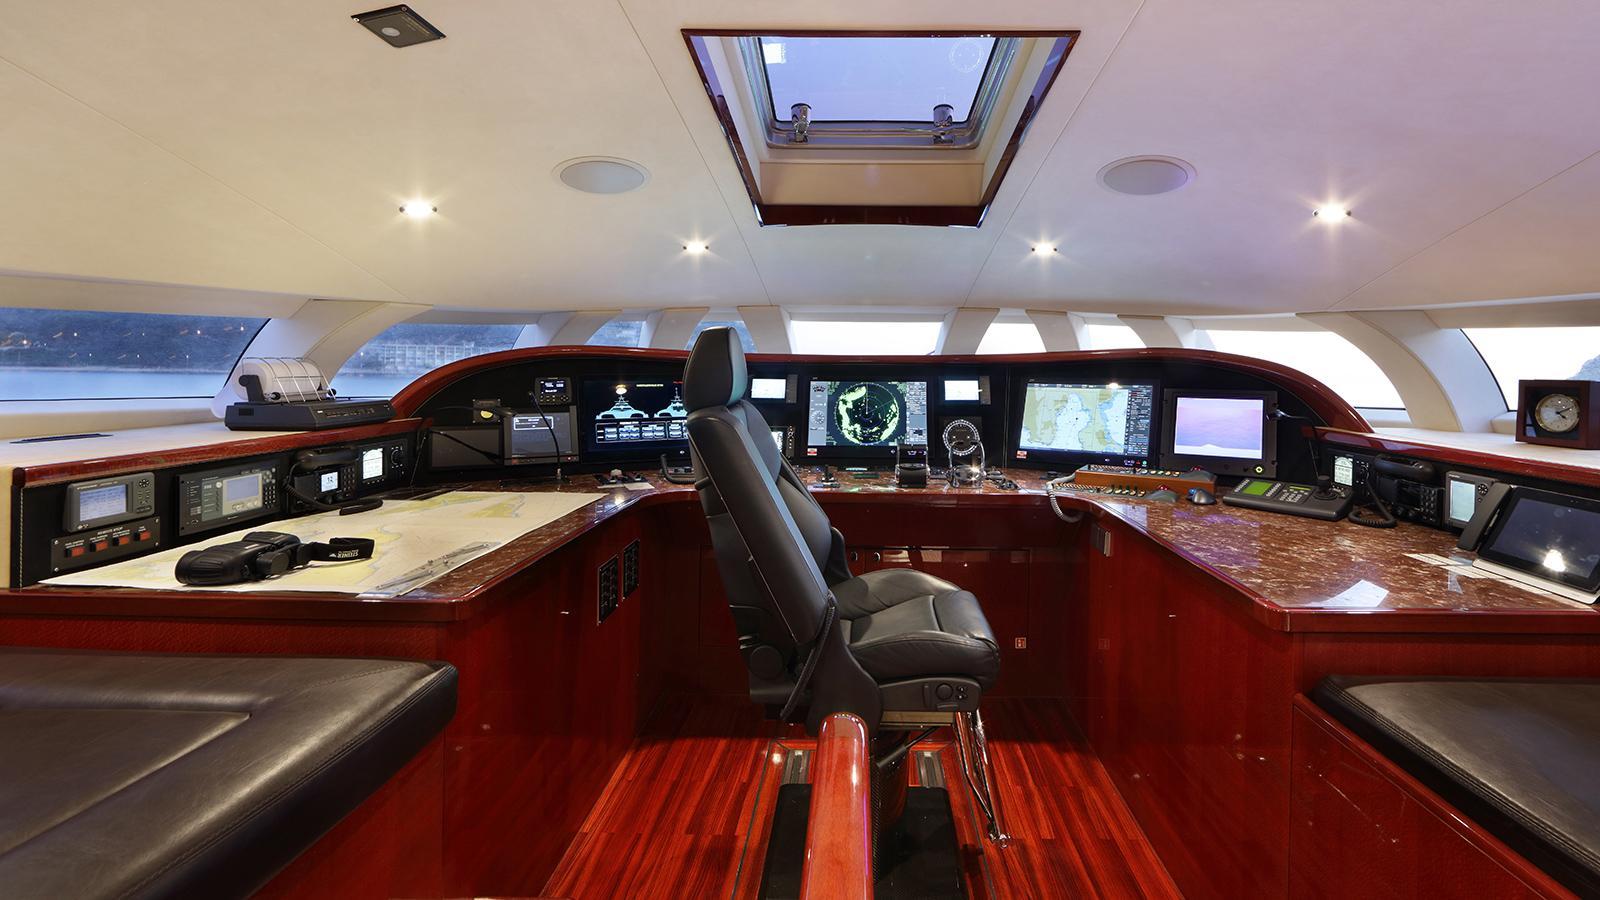 galaxy of happiness trimaran yacht latitude 2016 53m wheelhouse